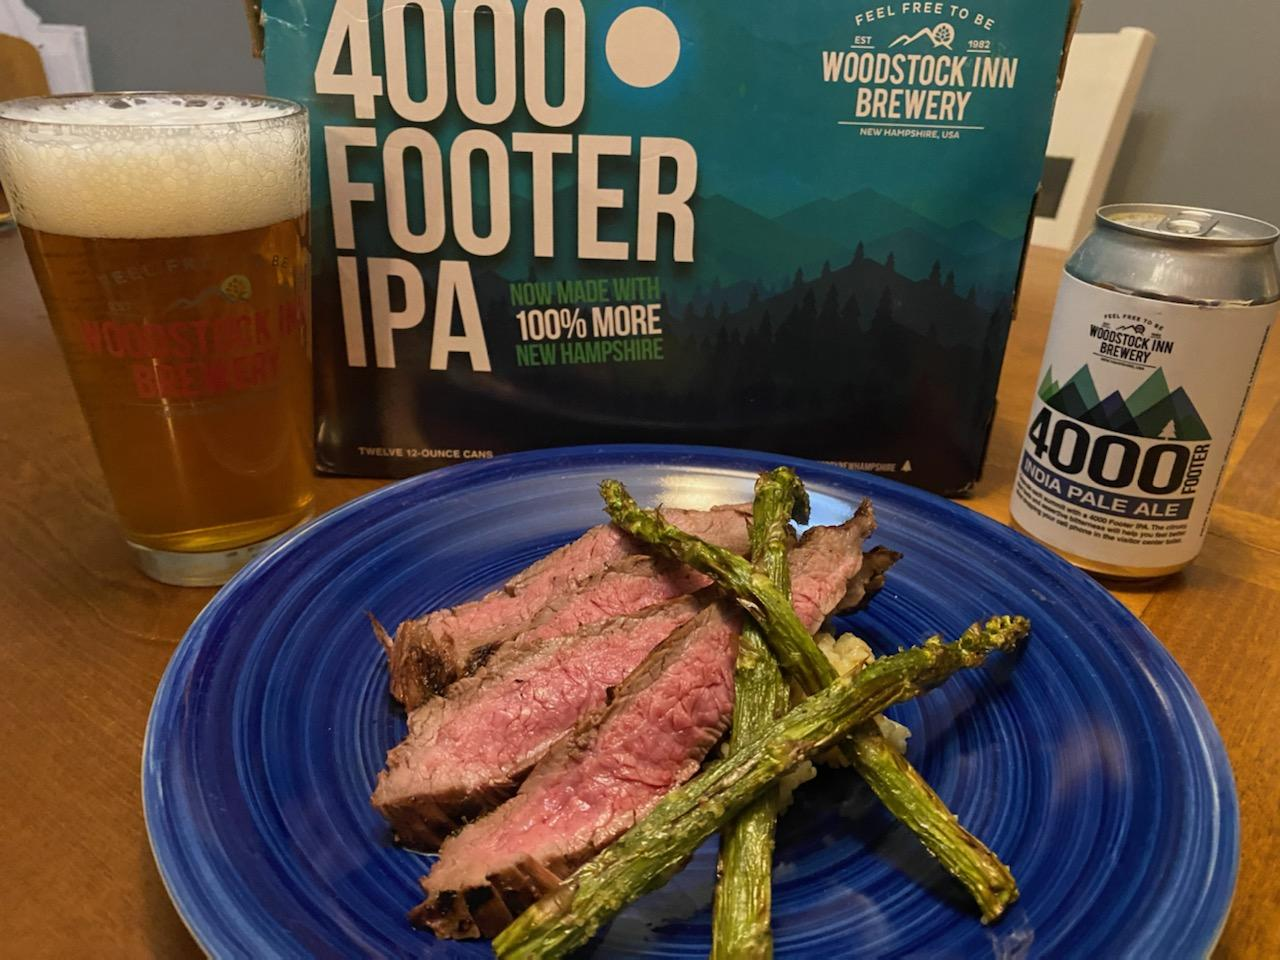 4000 Footer IPA Steak Marinade